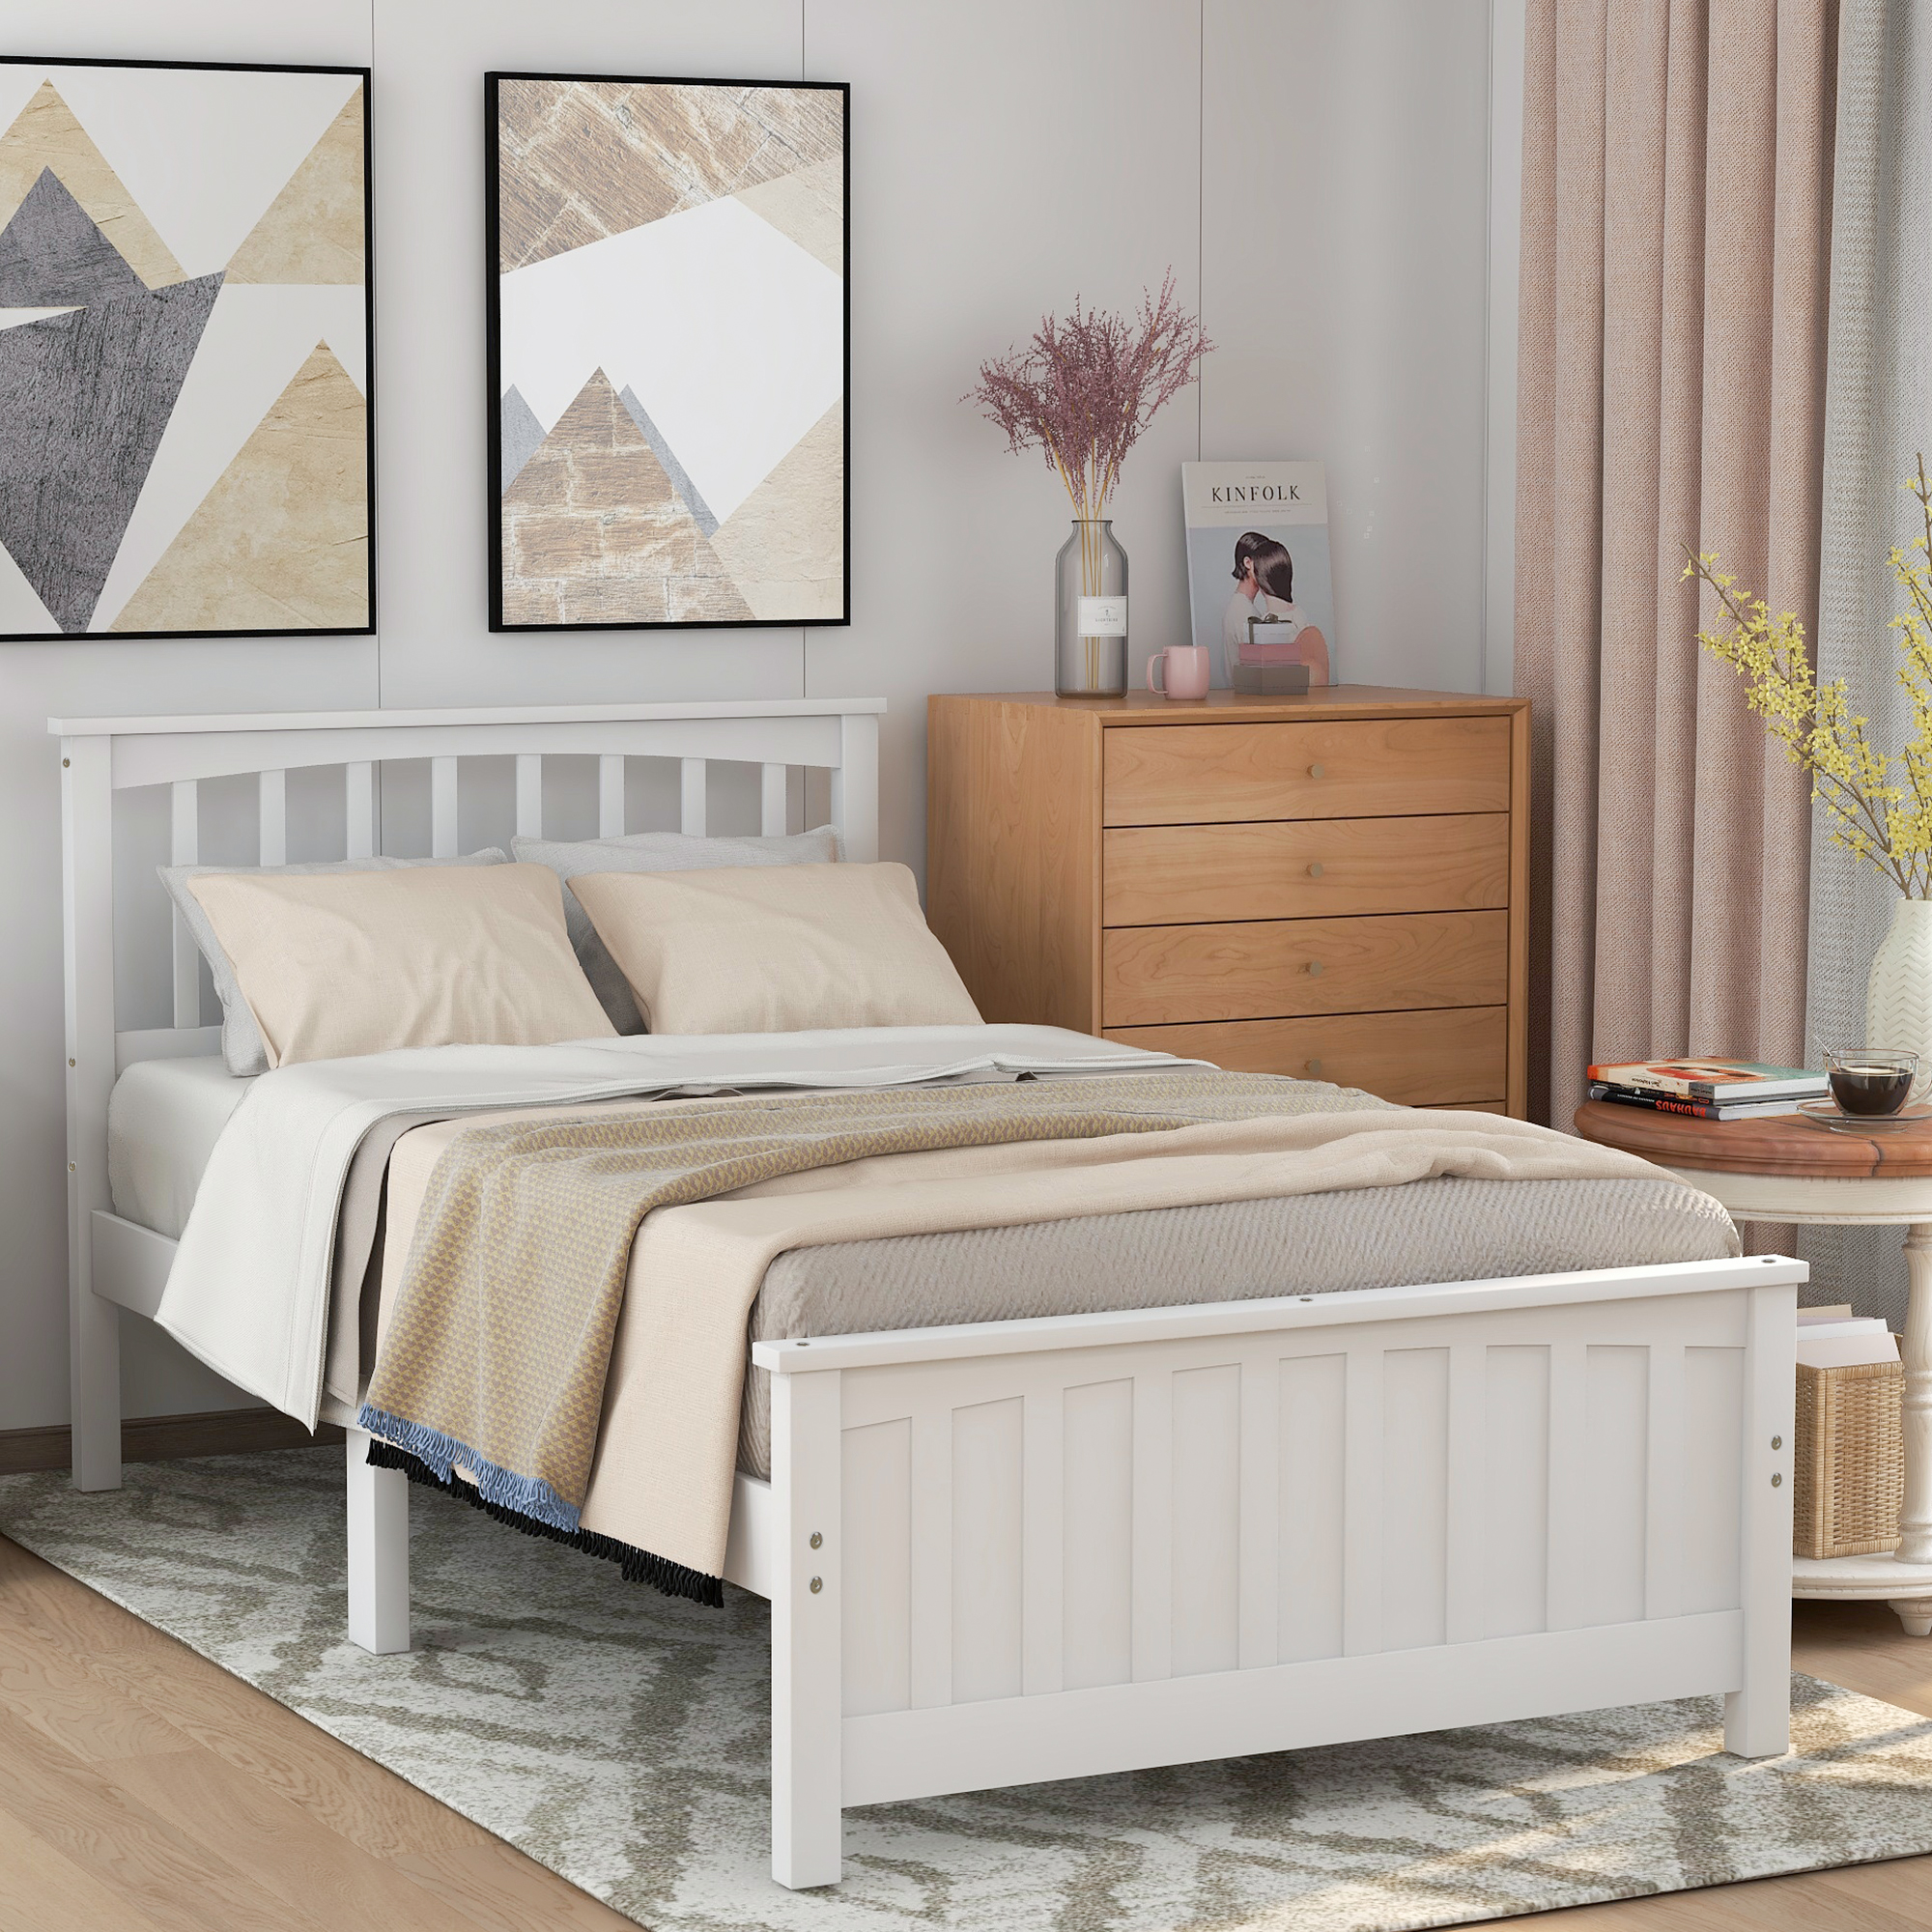 clearance twin bed frames for kids mordern platform bed on walmart bedroom furniture clearance id=84077